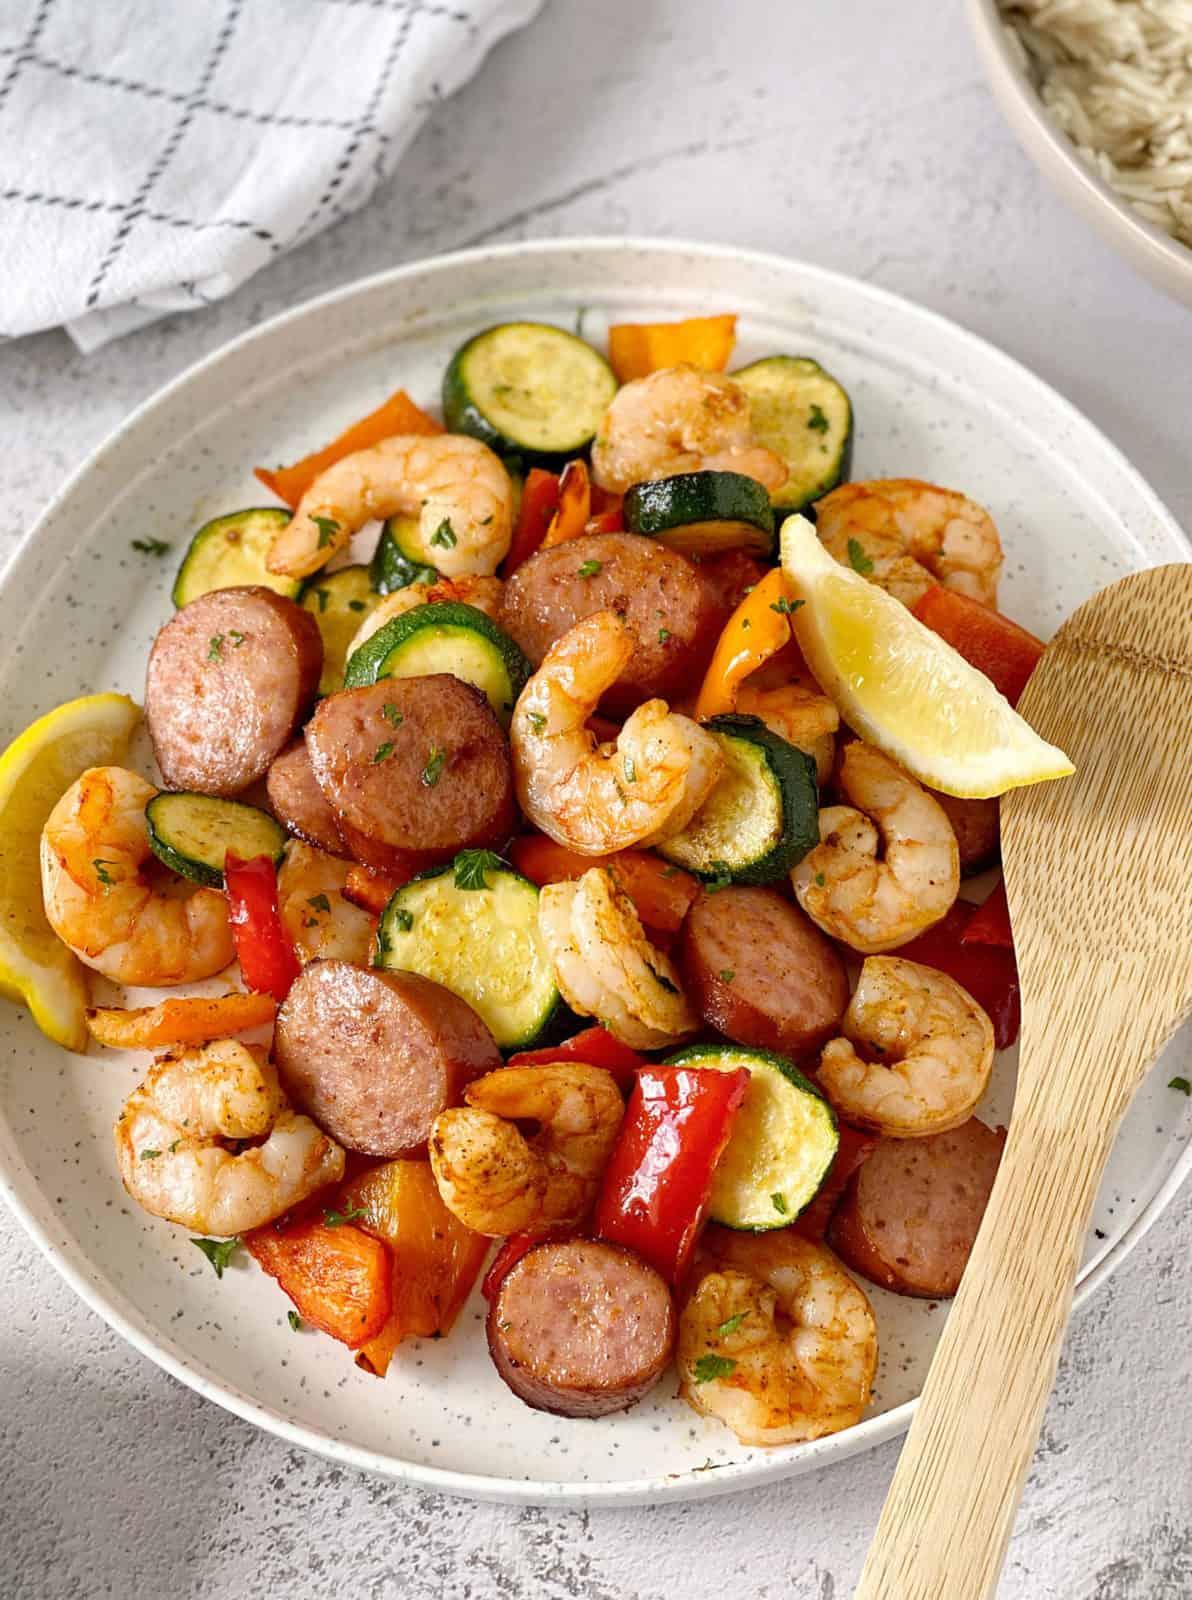 bowl of cajun shrimp and veggies